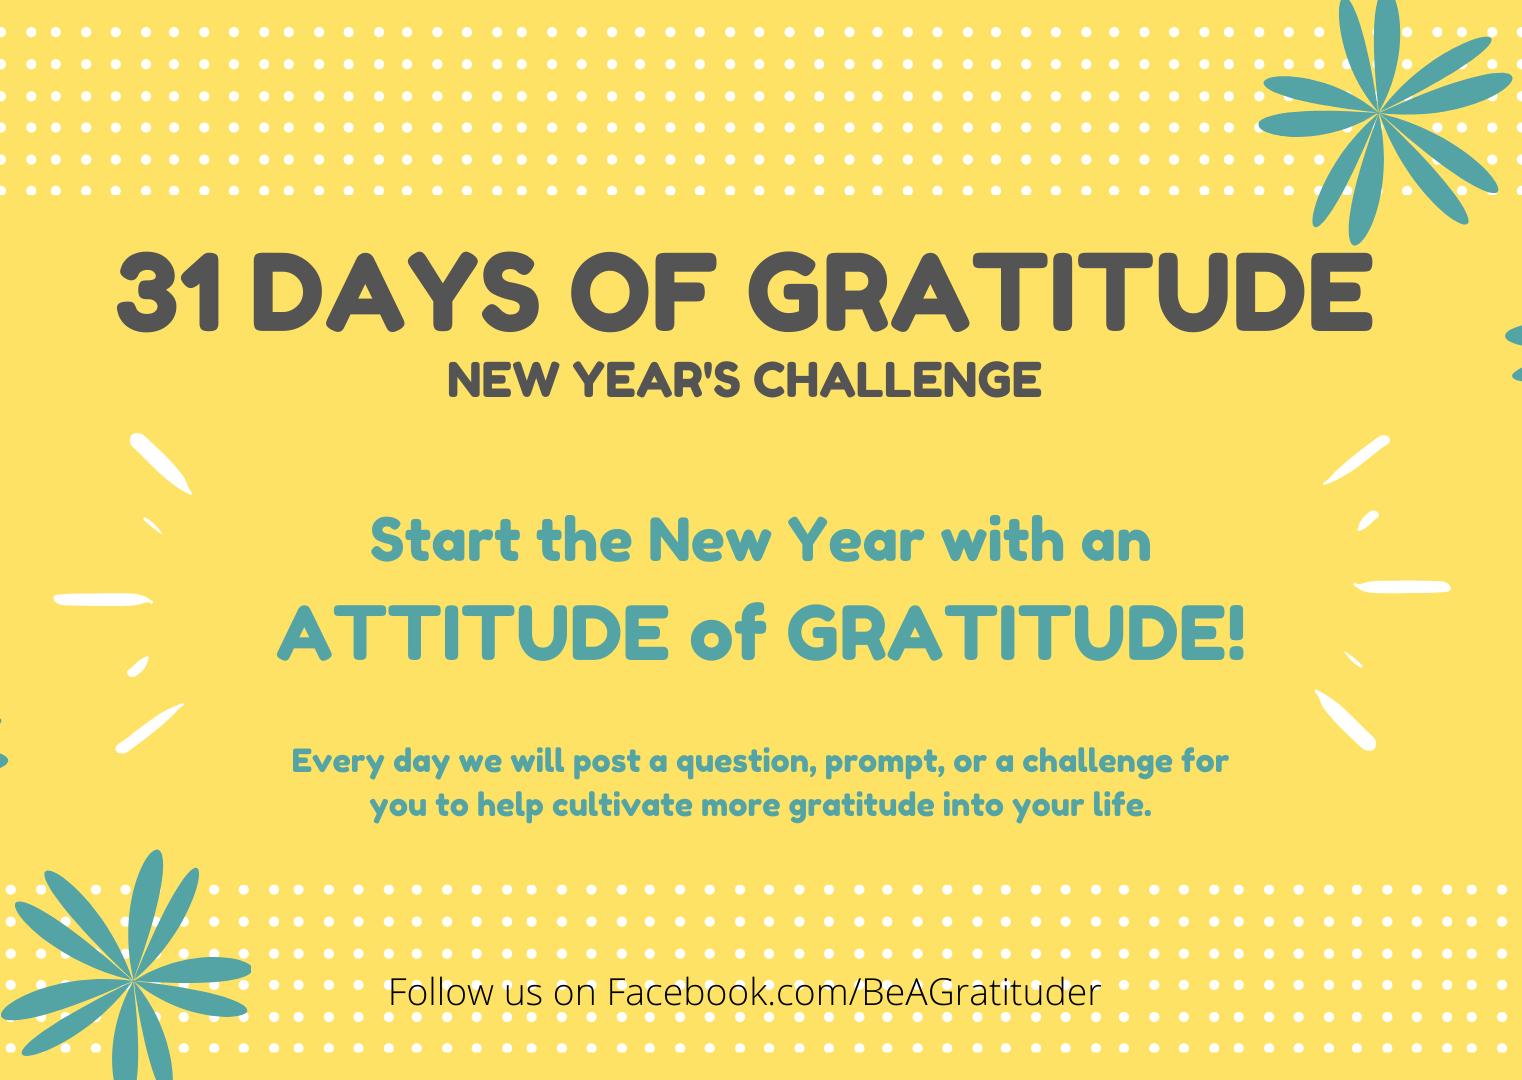 31 Days of Gratitude Challenge